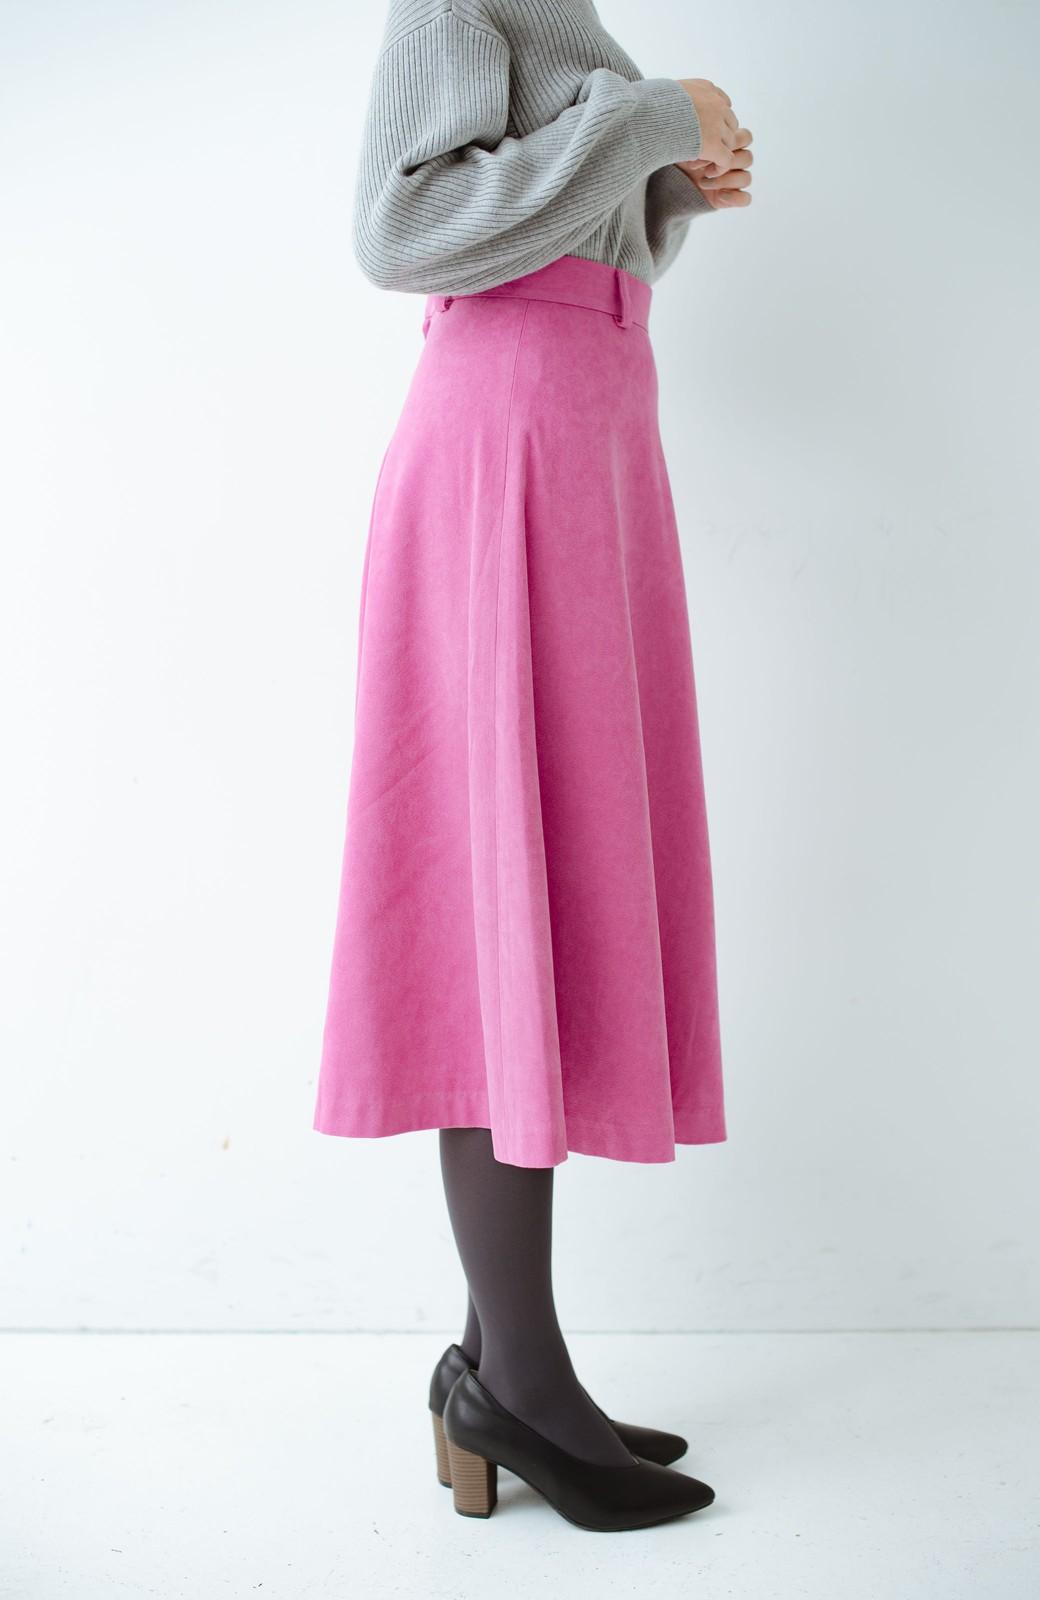 haco! 女っぽく上品に見える フレアースカート by que made me <ピンク>の商品写真3